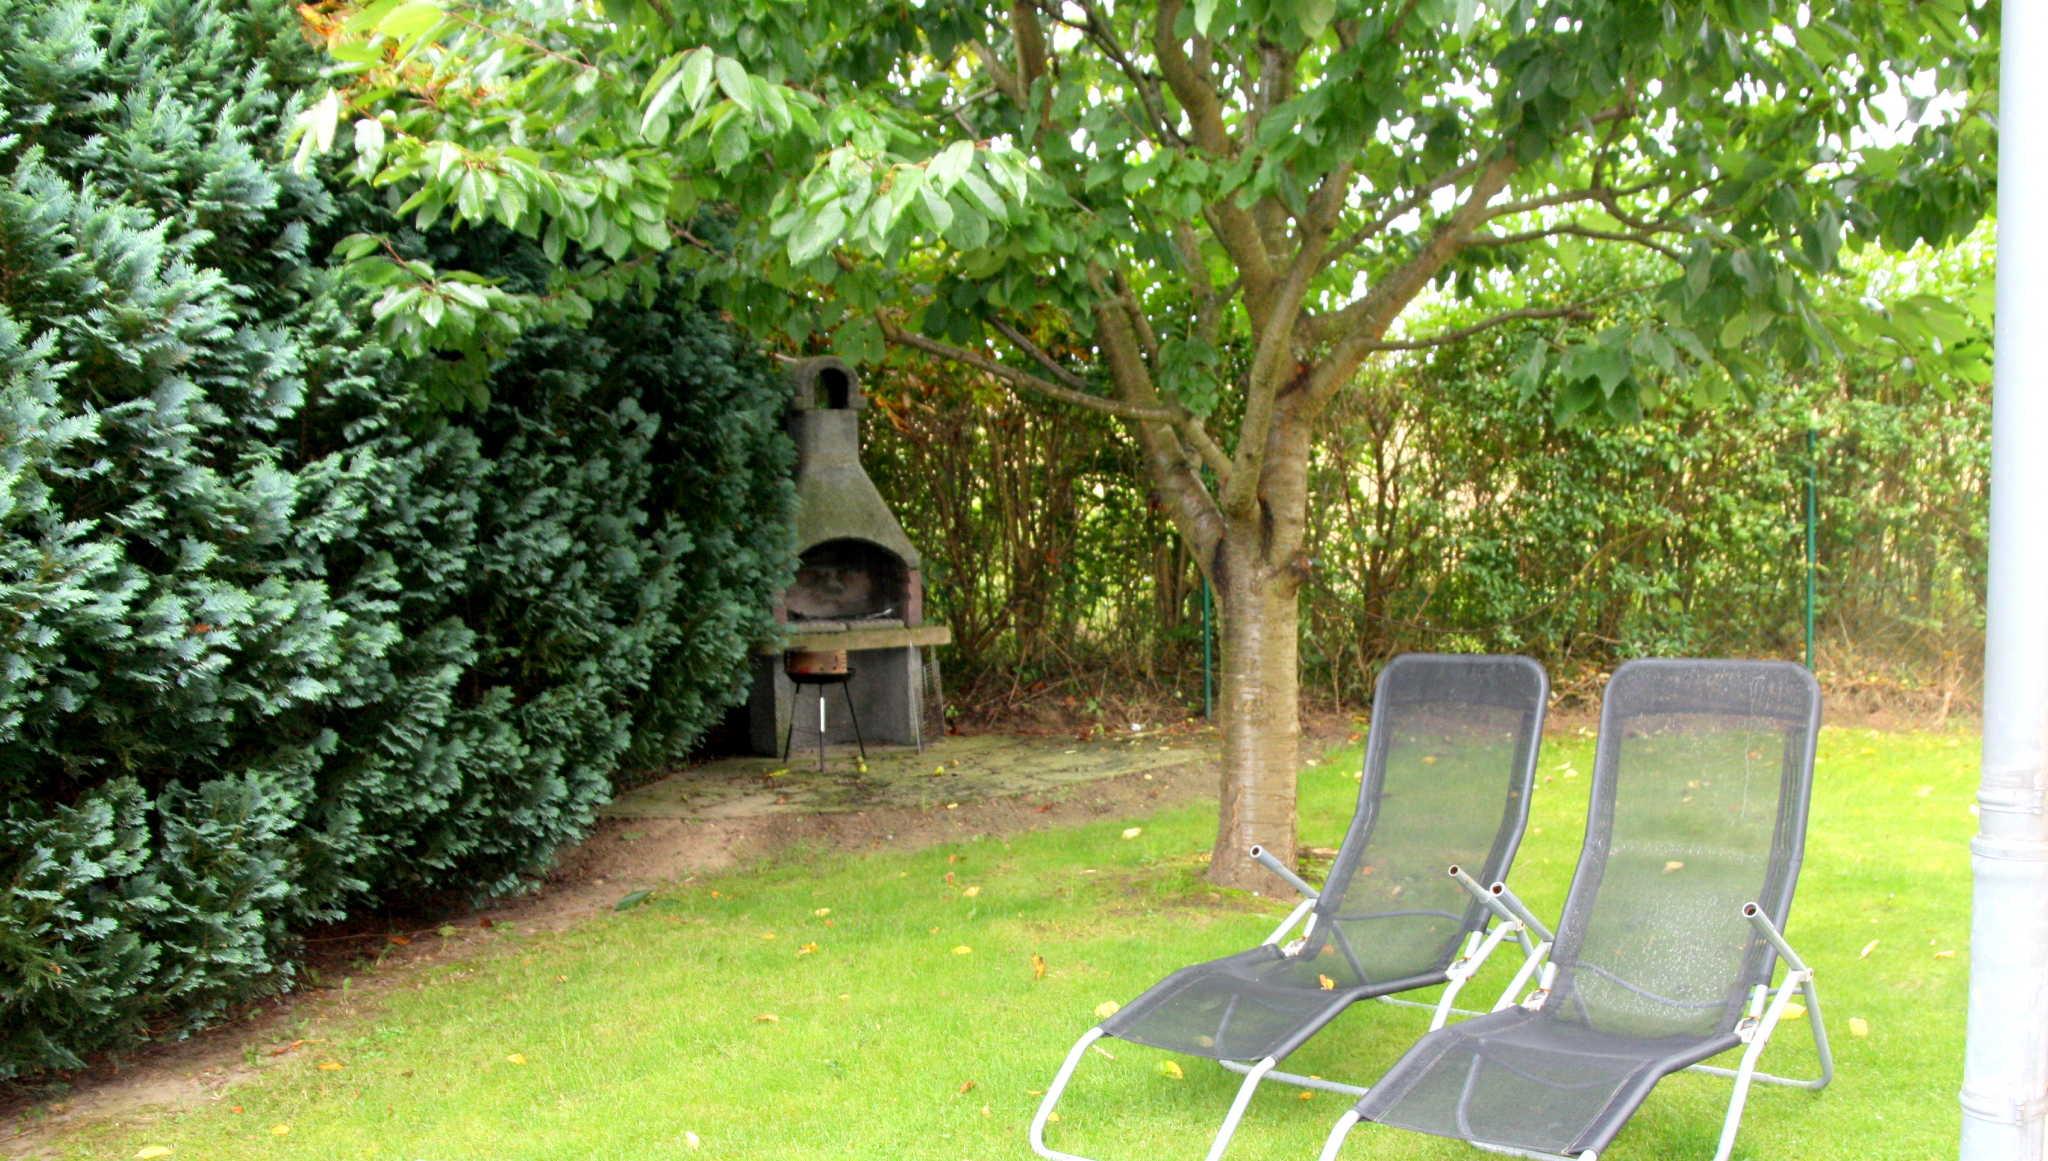 Garten am Haus mit Sitzgruppen / Liegen